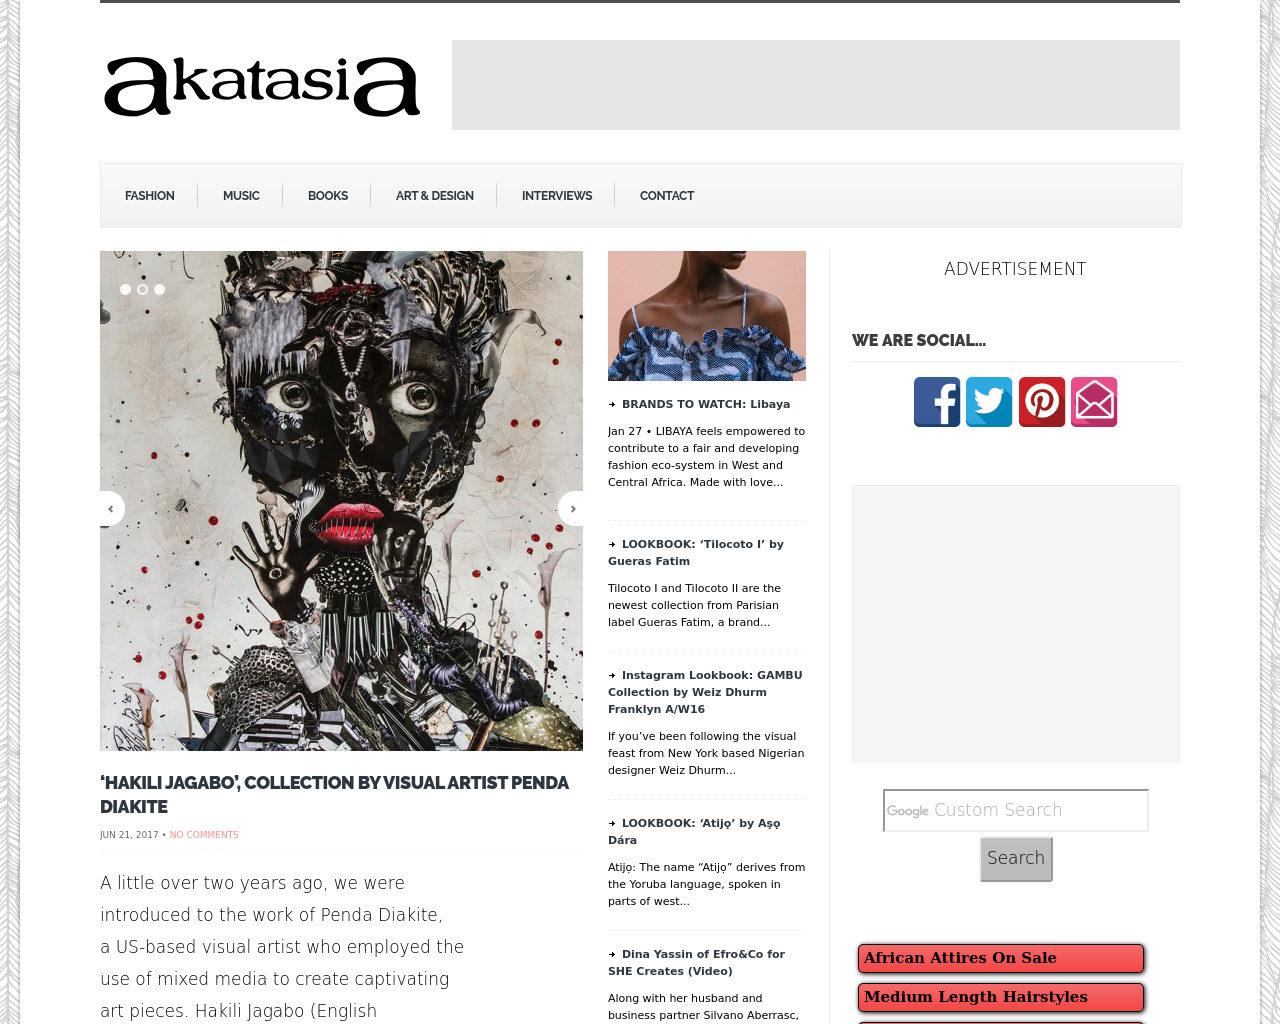 Akatasia-Advertising-Reviews-Pricing